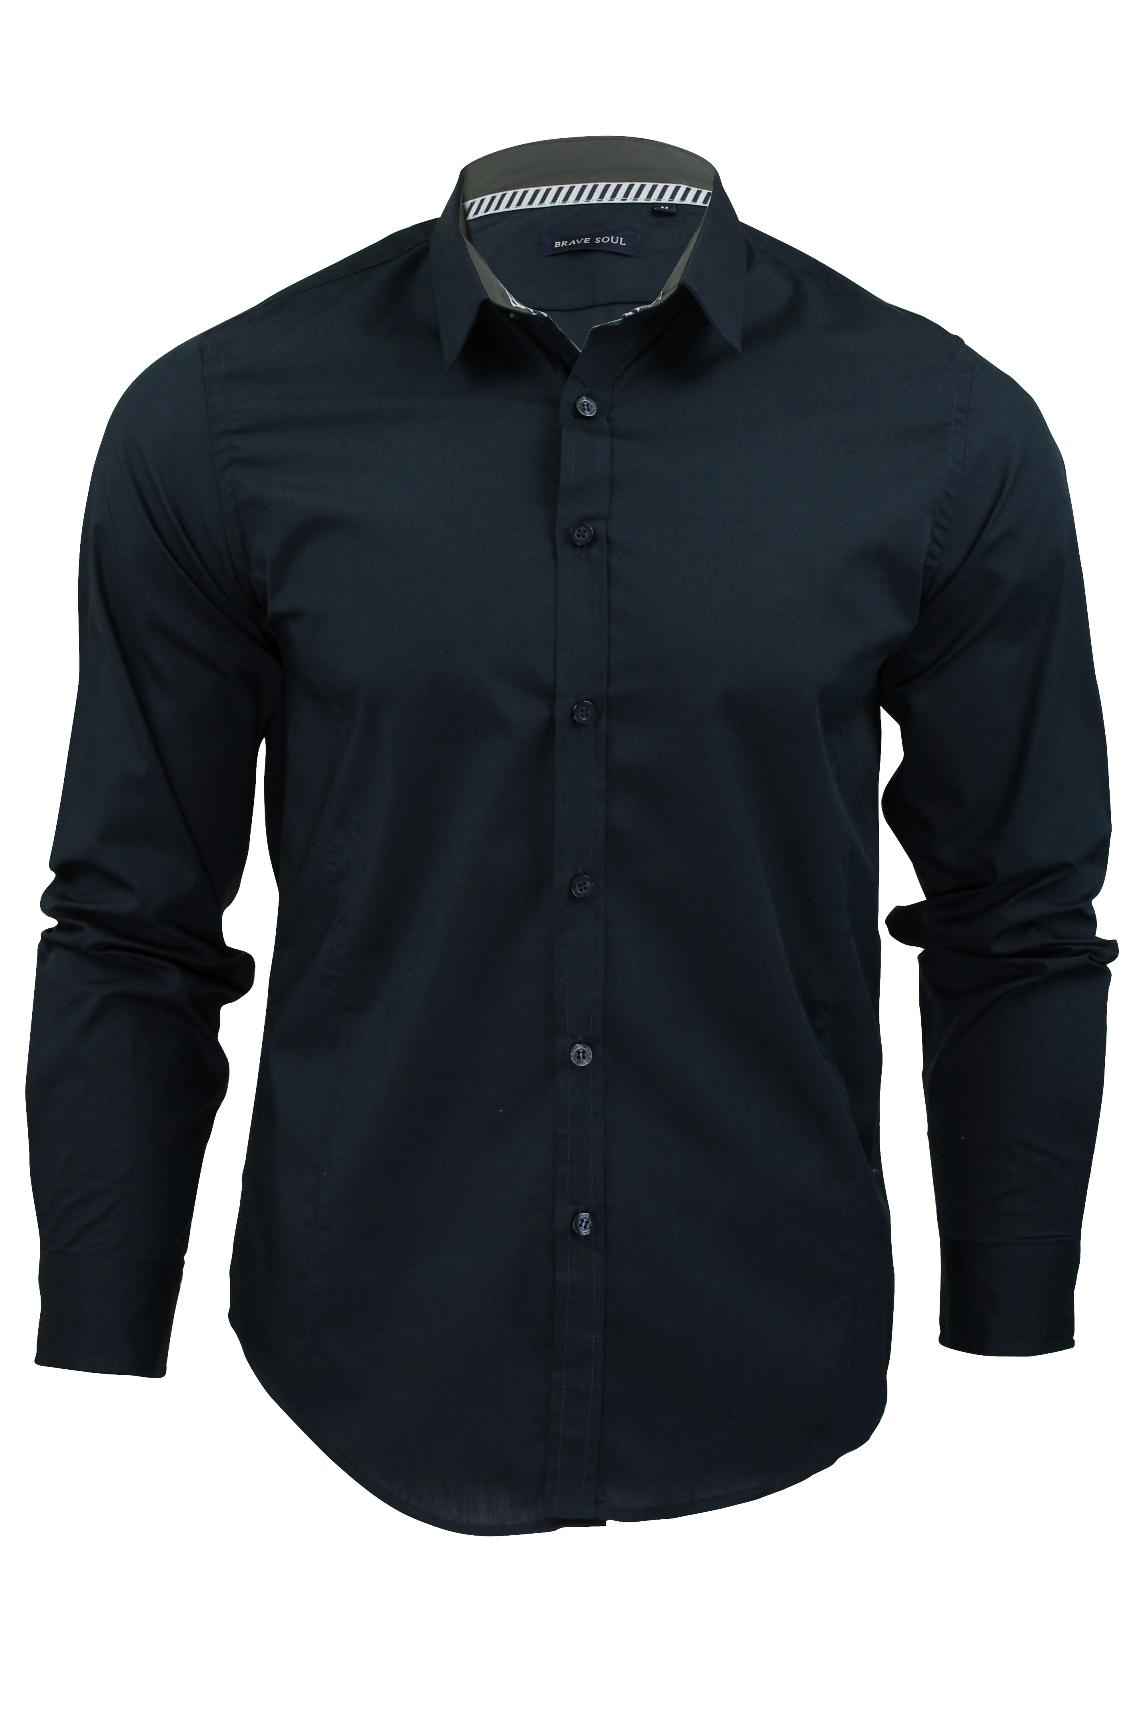 Mens-Plain-Shirt-by-Brave-Soul-039-Tudor-039-Long-Sleeved thumbnail 9